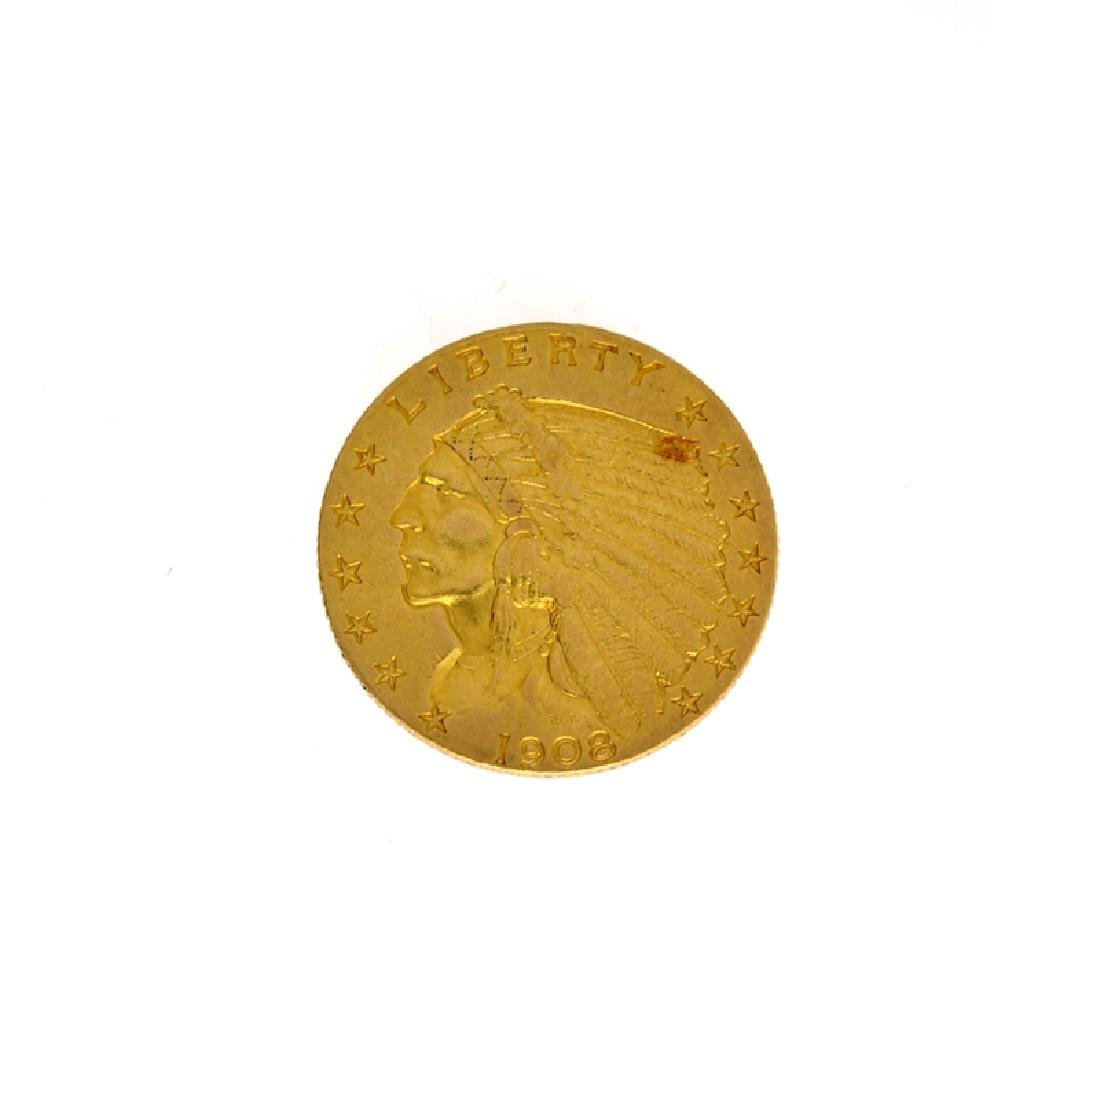 *1908 $2.50 U.S. Indian Head Gold Coin (DF)